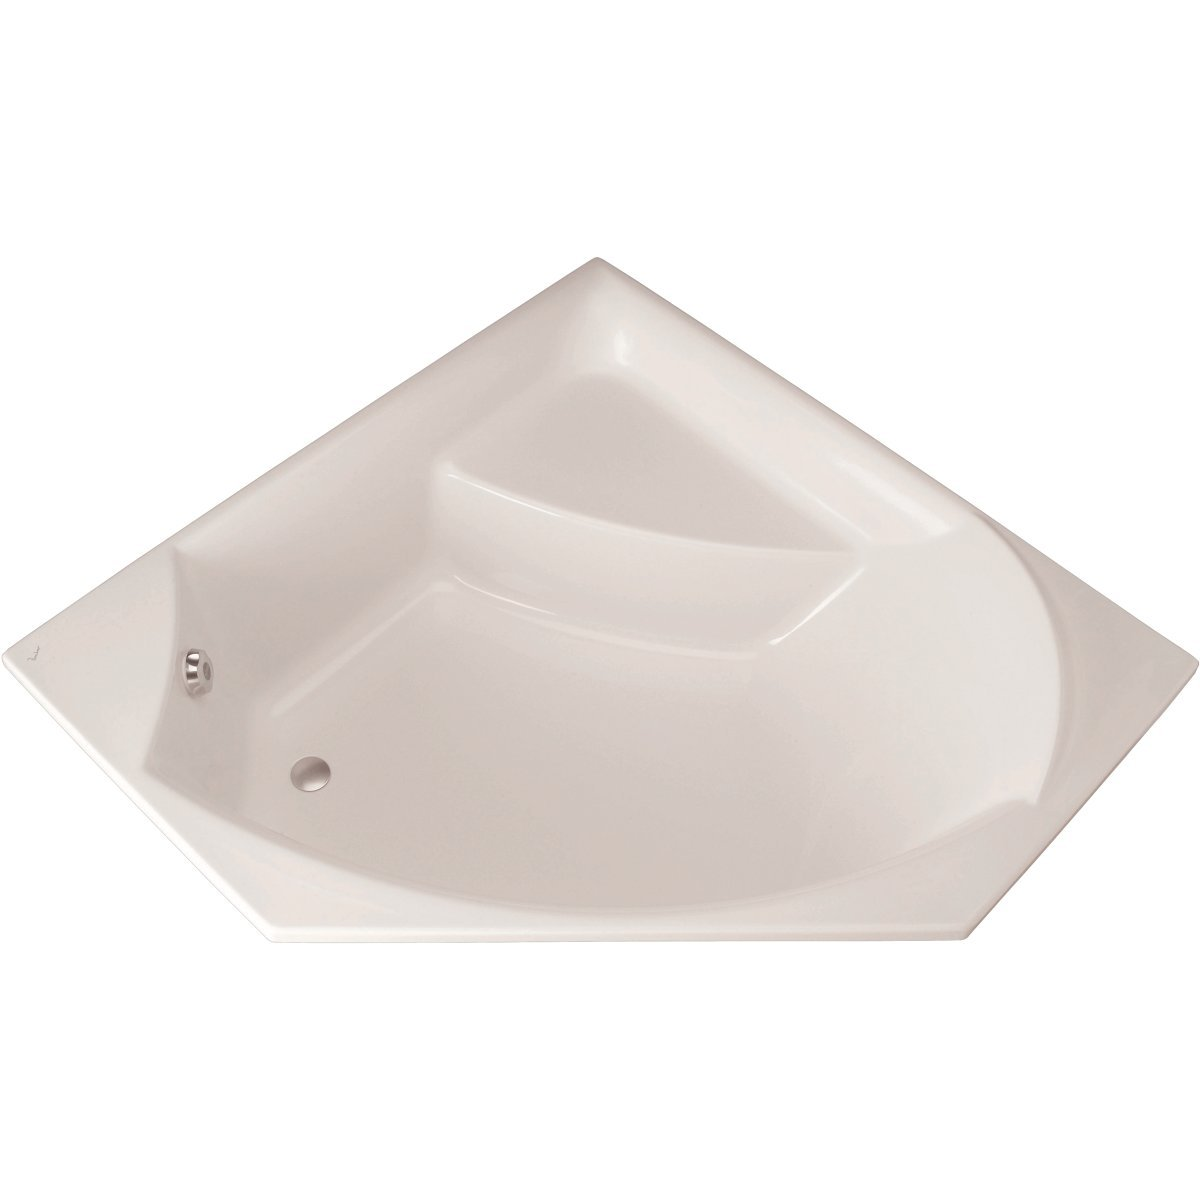 Baignoire kheops2 140 blanc ideal standard grenoble for Baignoire largeur 60